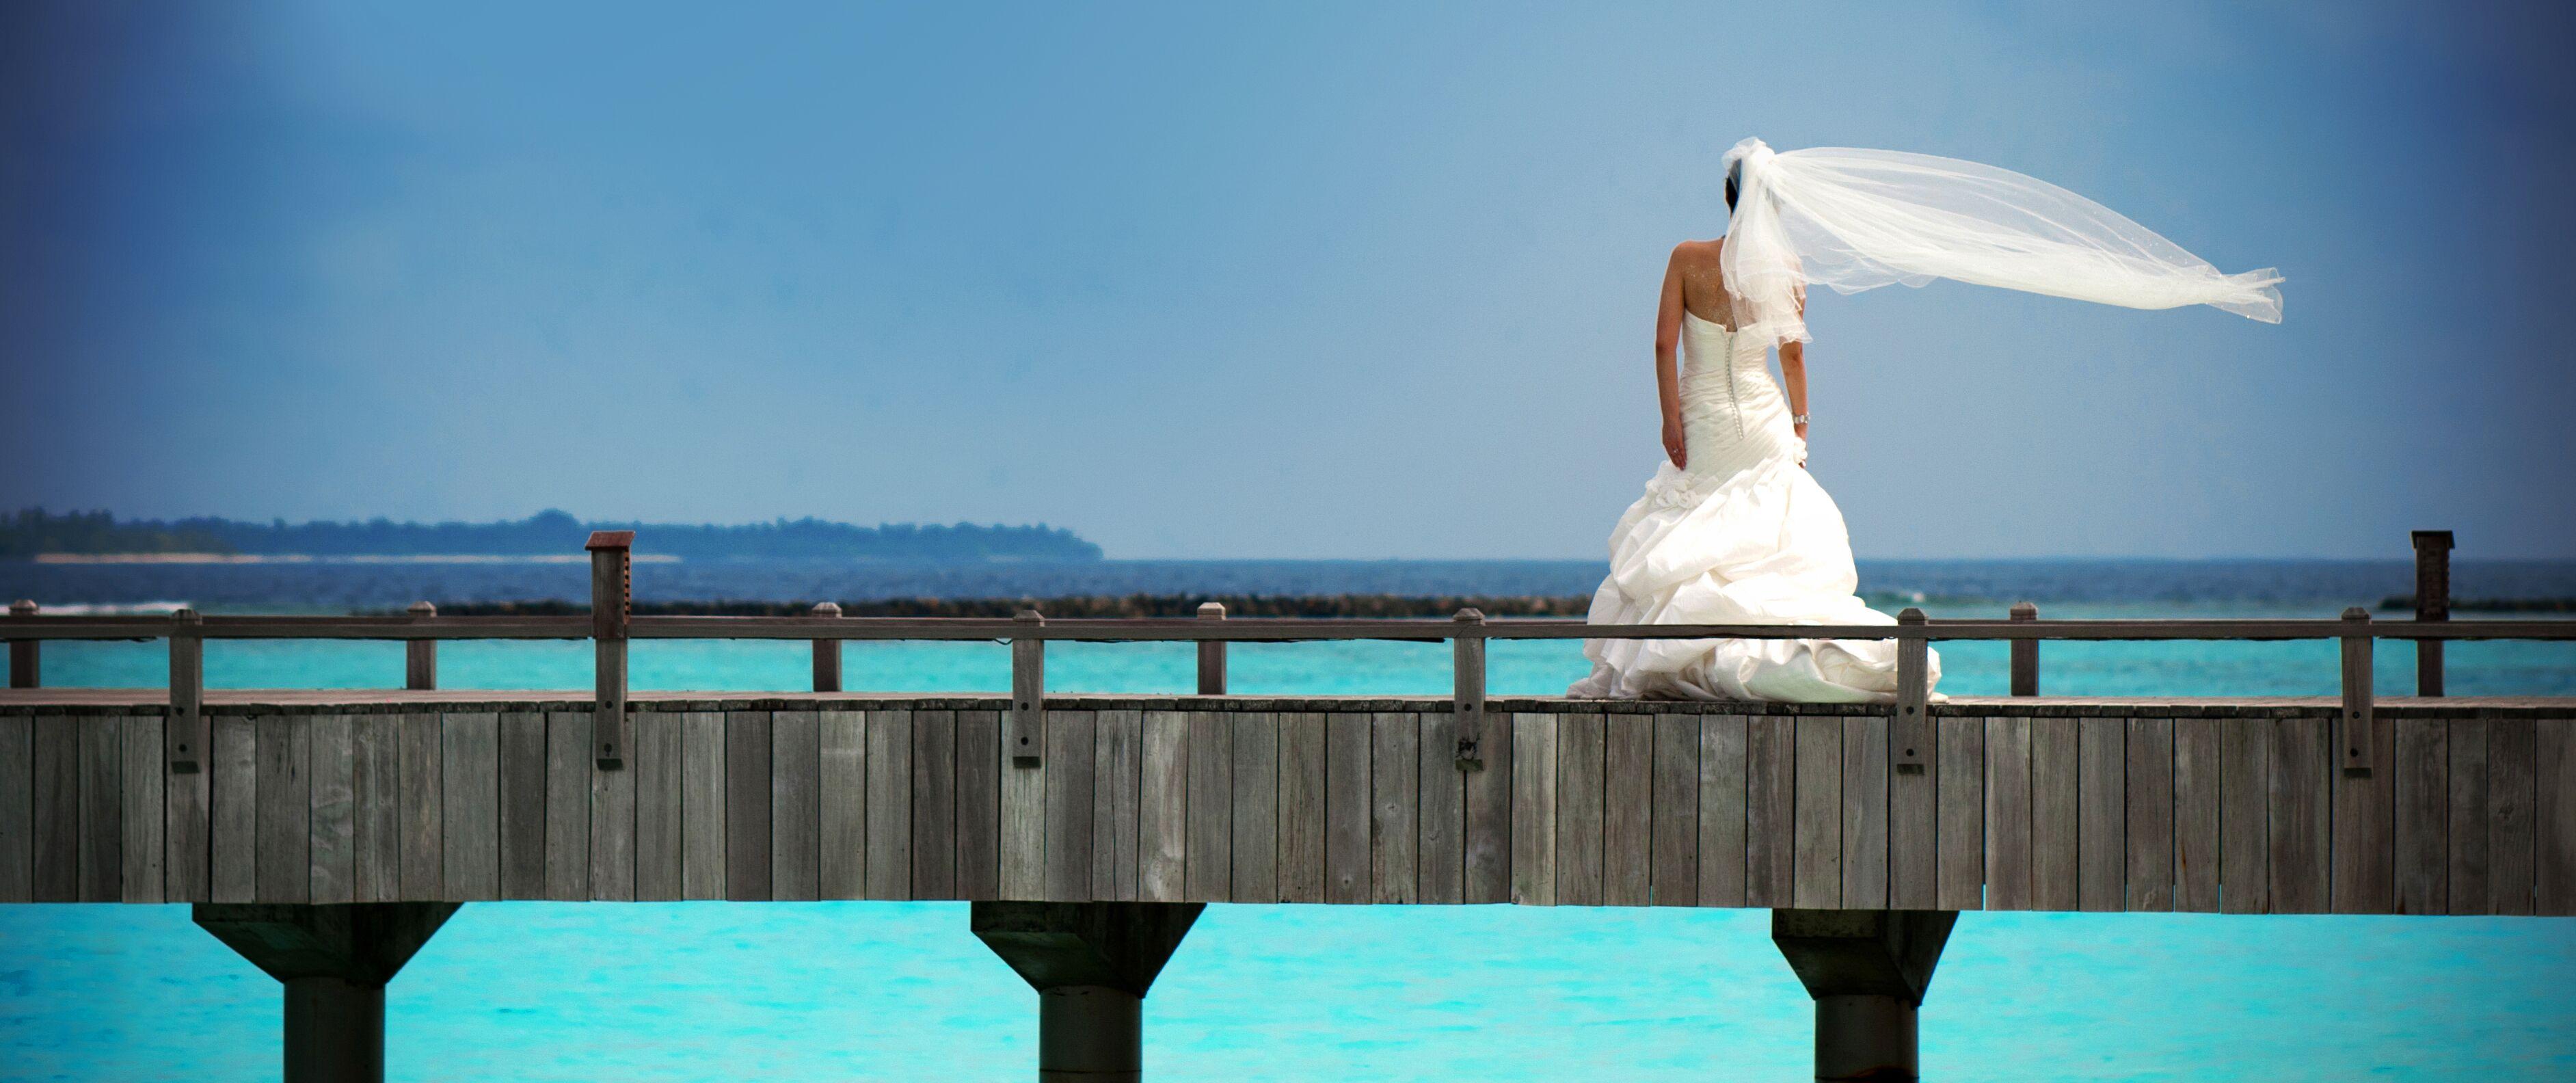 Noocea Mariage Aux Maldives